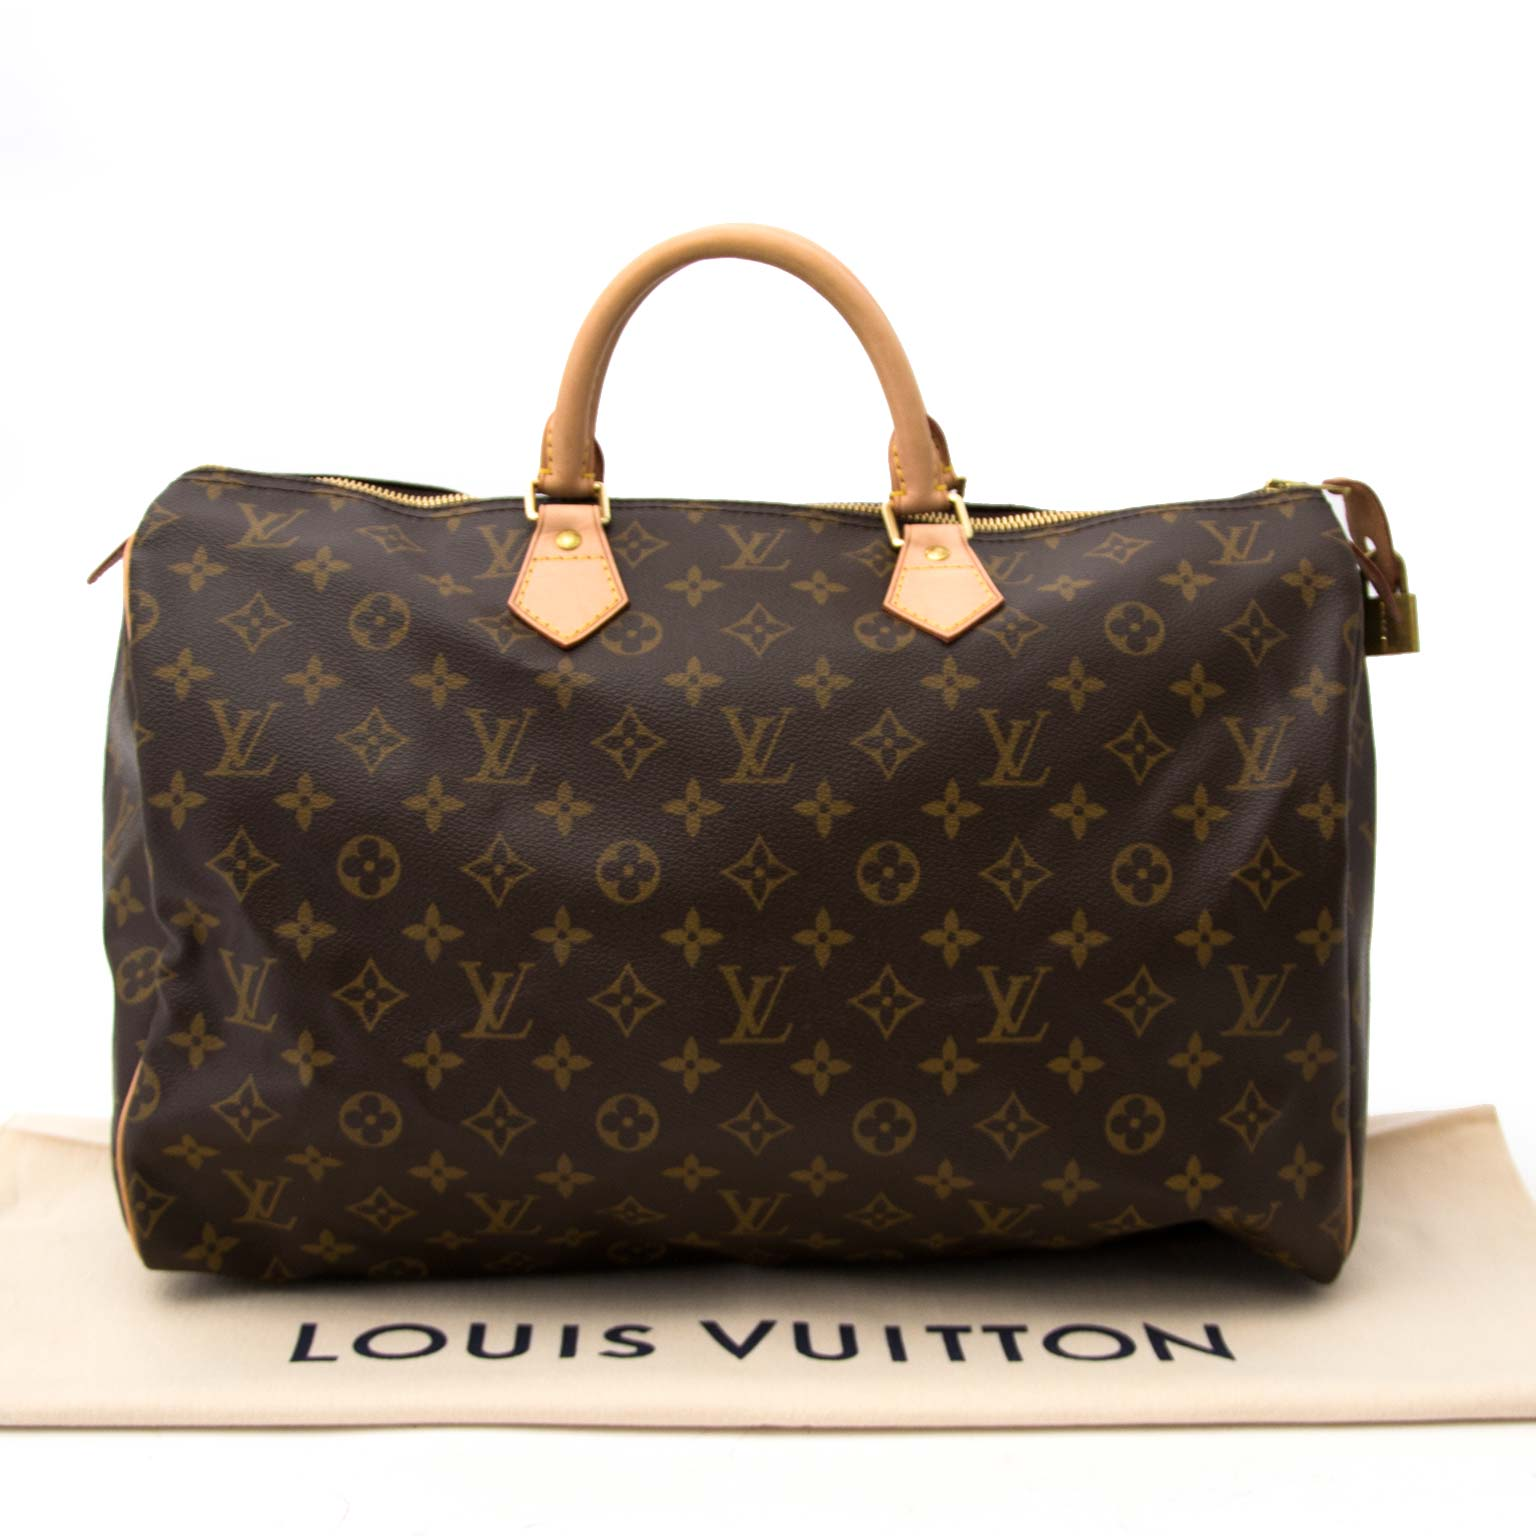 c897e0864a42 Labellov Buy authentic vintage Louis Vuitton online with Labellov ...